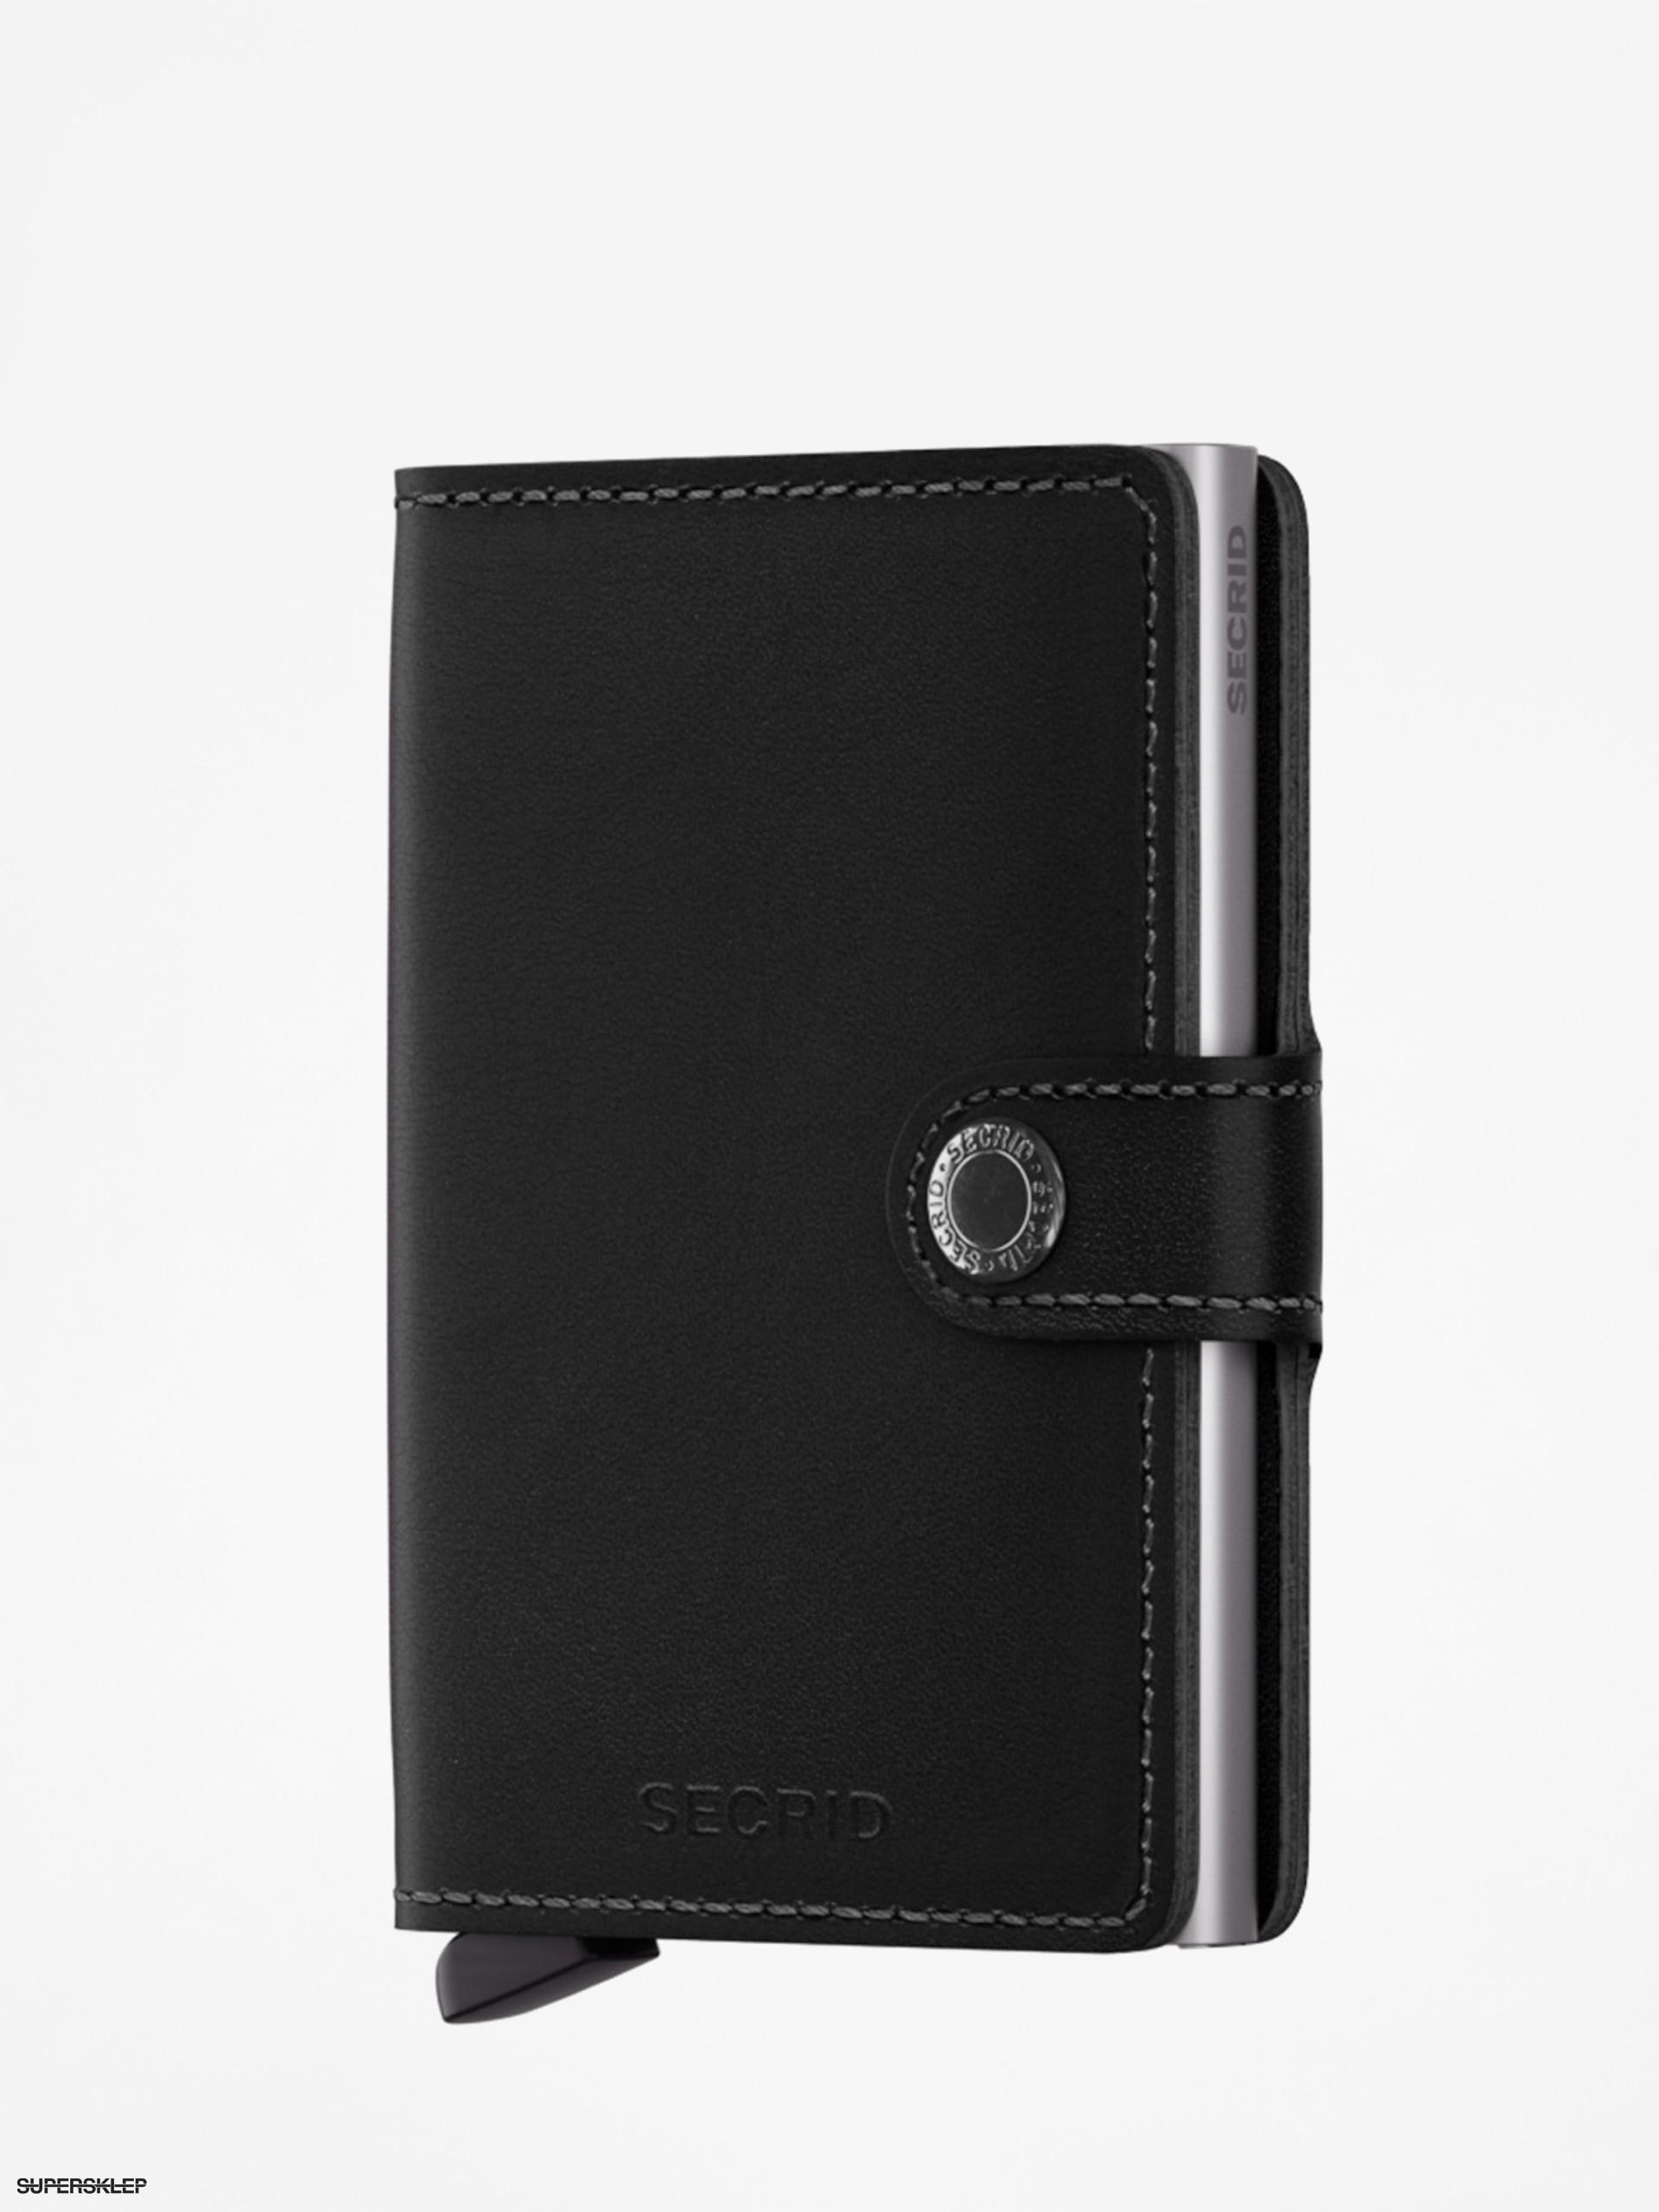 74879be659 Peňaženka Secrid Miniwallet (black)